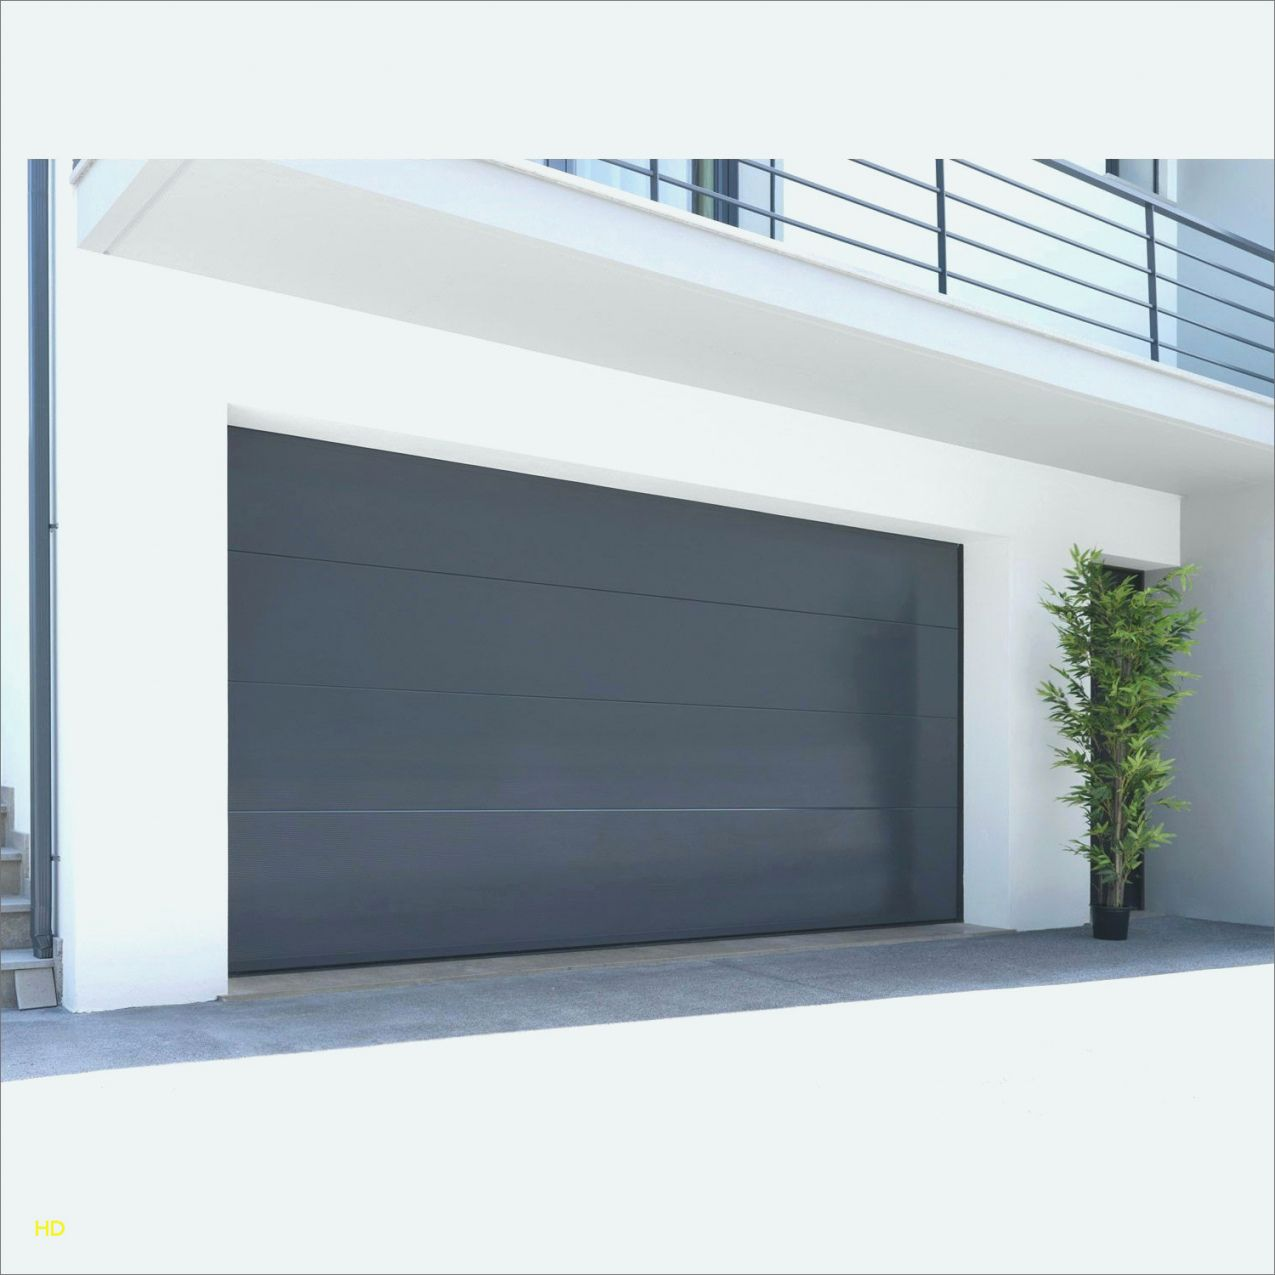 77 Porte De Garage Enroulable Lapeyre 2020 Outdoor Decor Kitchen Design Home Decor